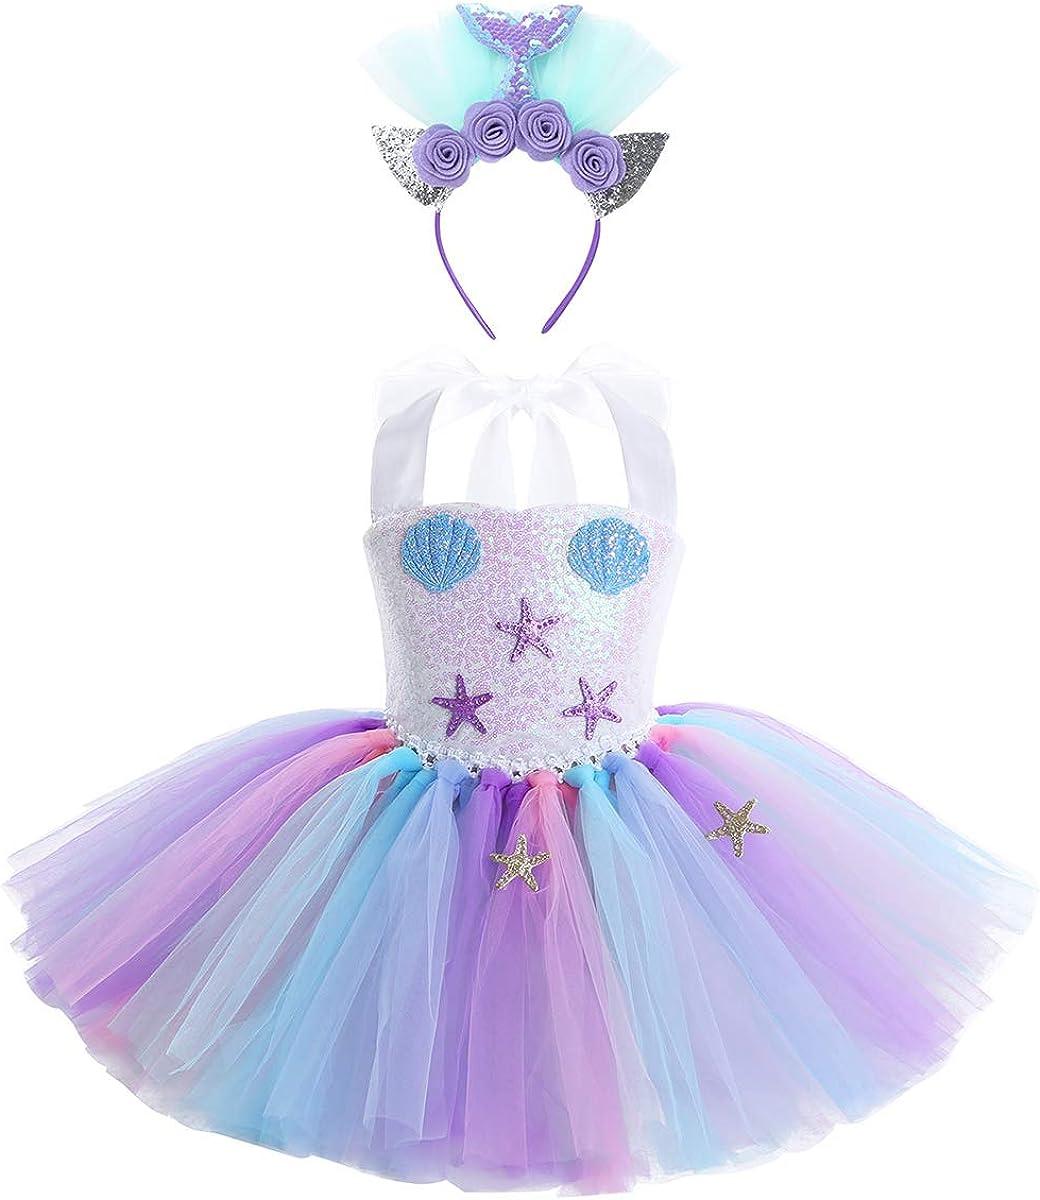 Princess Girls Rainbow Fancy Dress Mermaid Tutu Outfit Cosplay Party Kid Costume